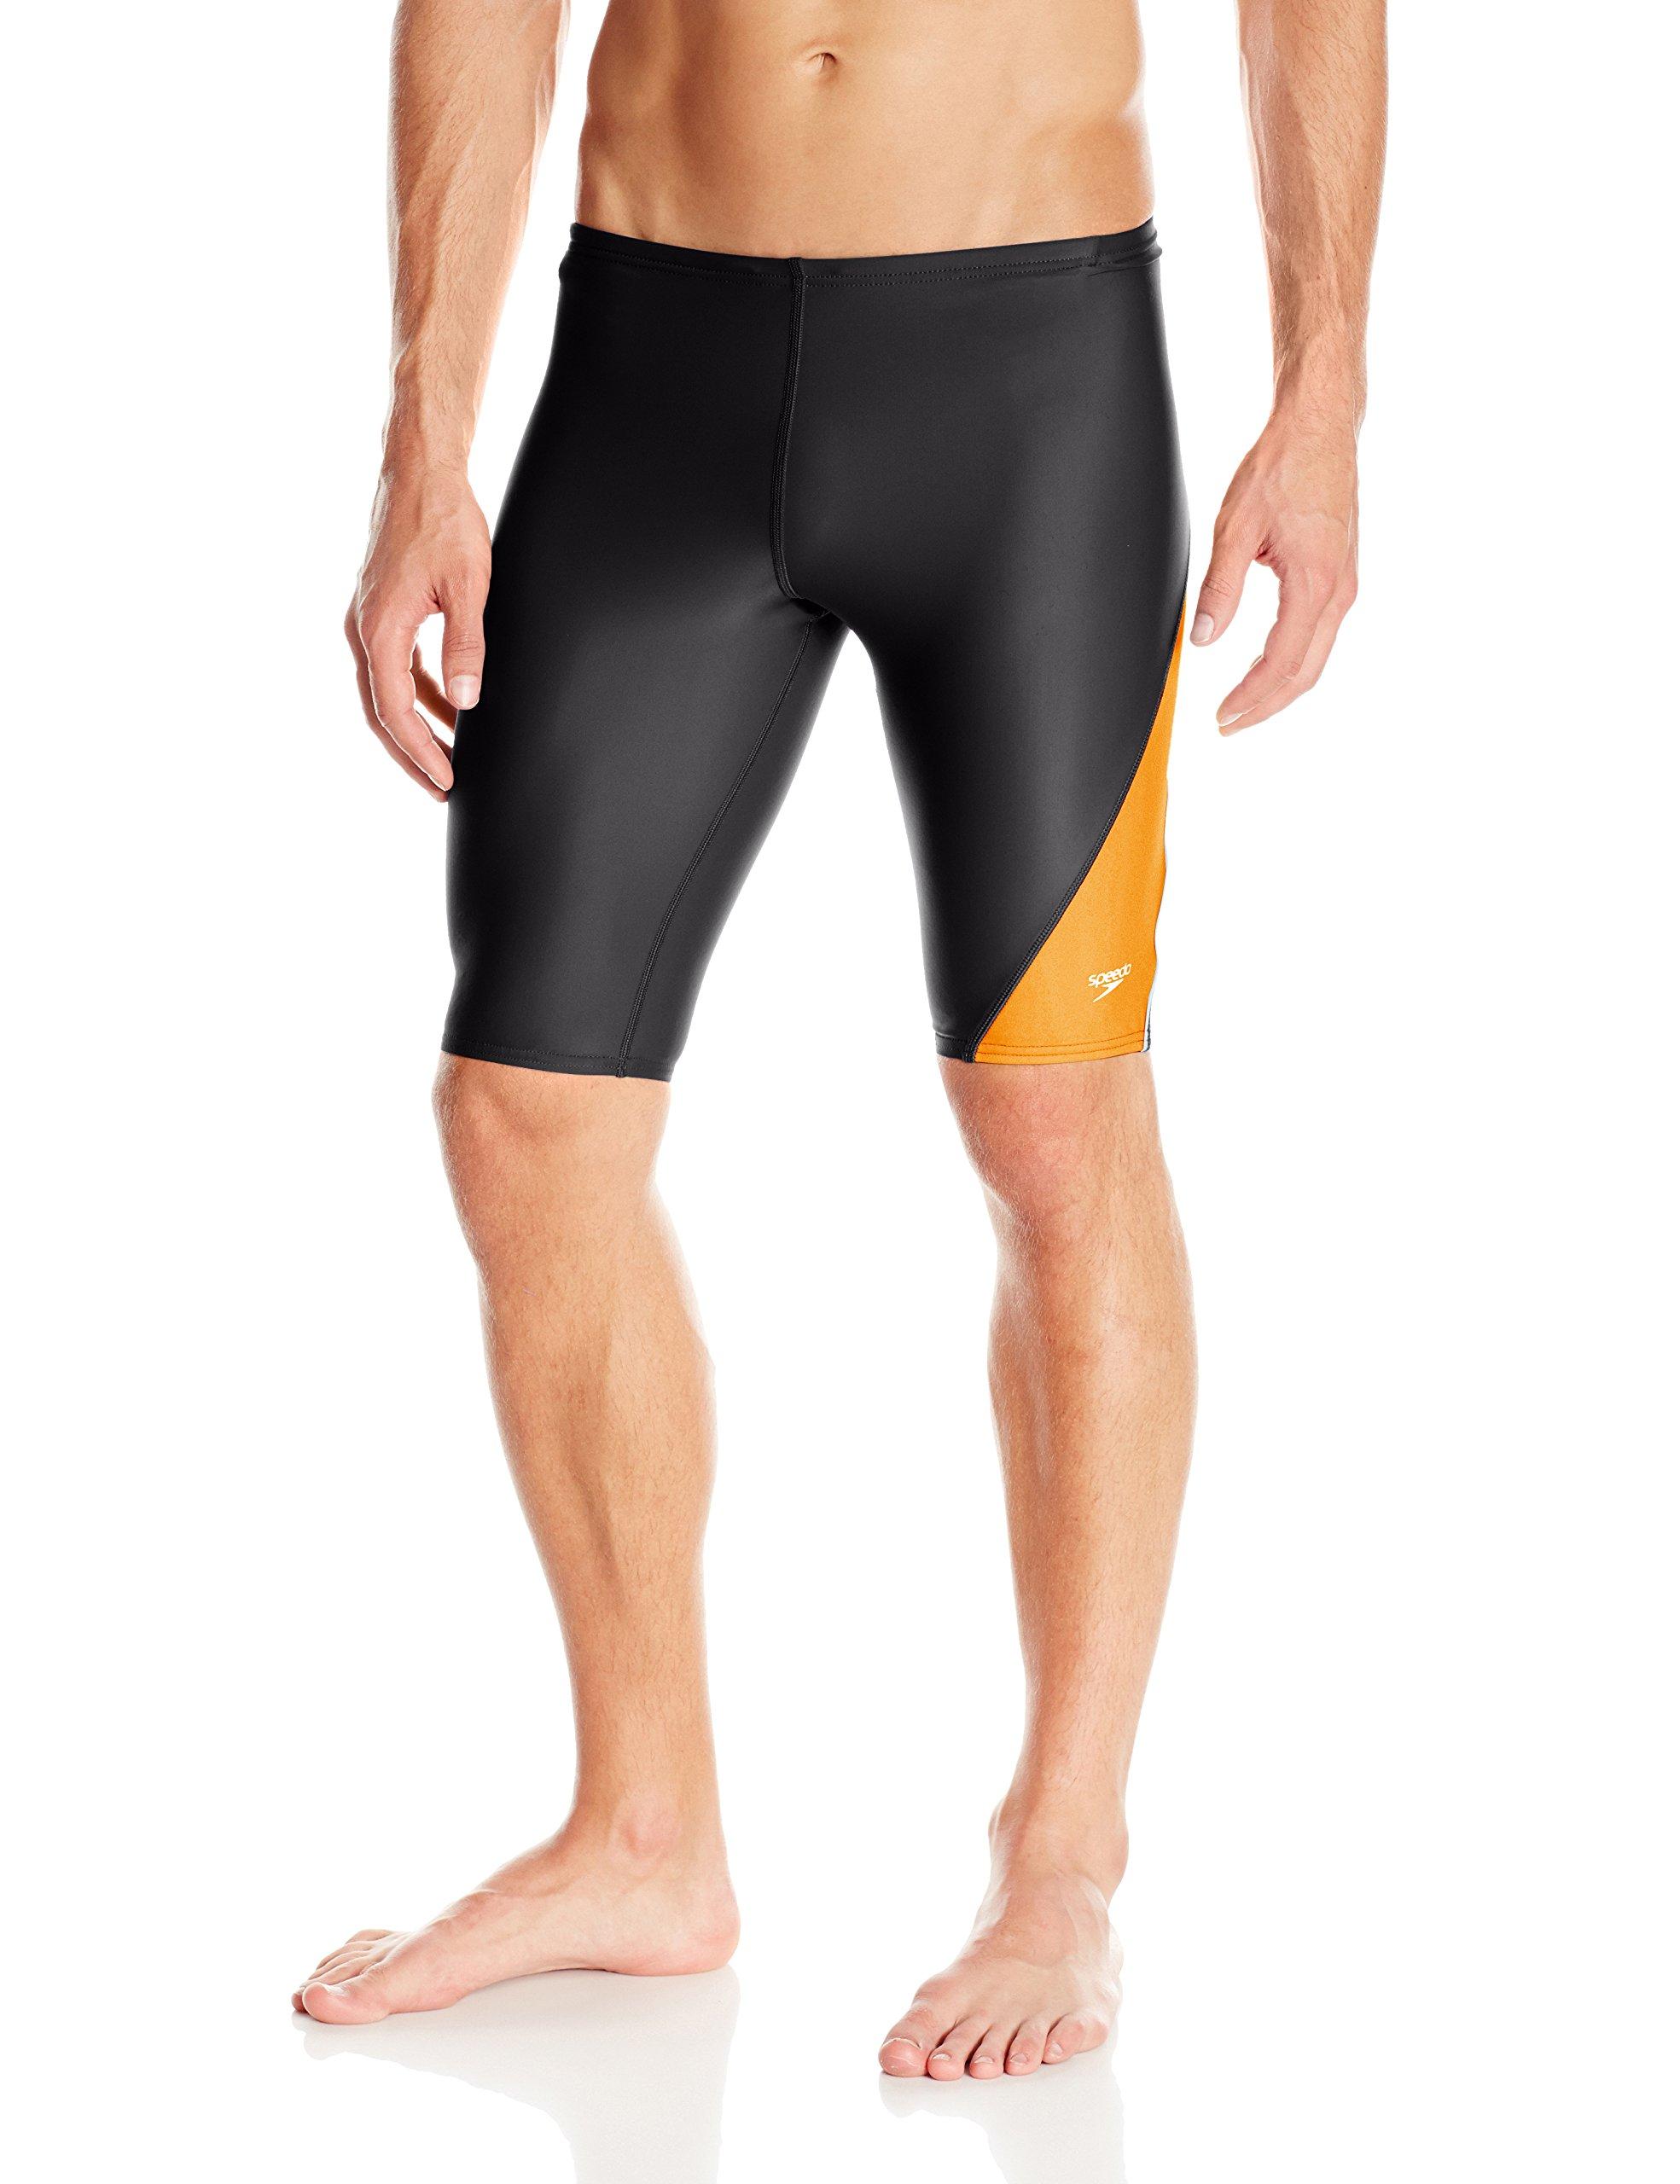 Speedo Men and Boys' Jammer Swimsuit-PowerFLEX Eco Revolve Splice, Orange, 38 by Speedo